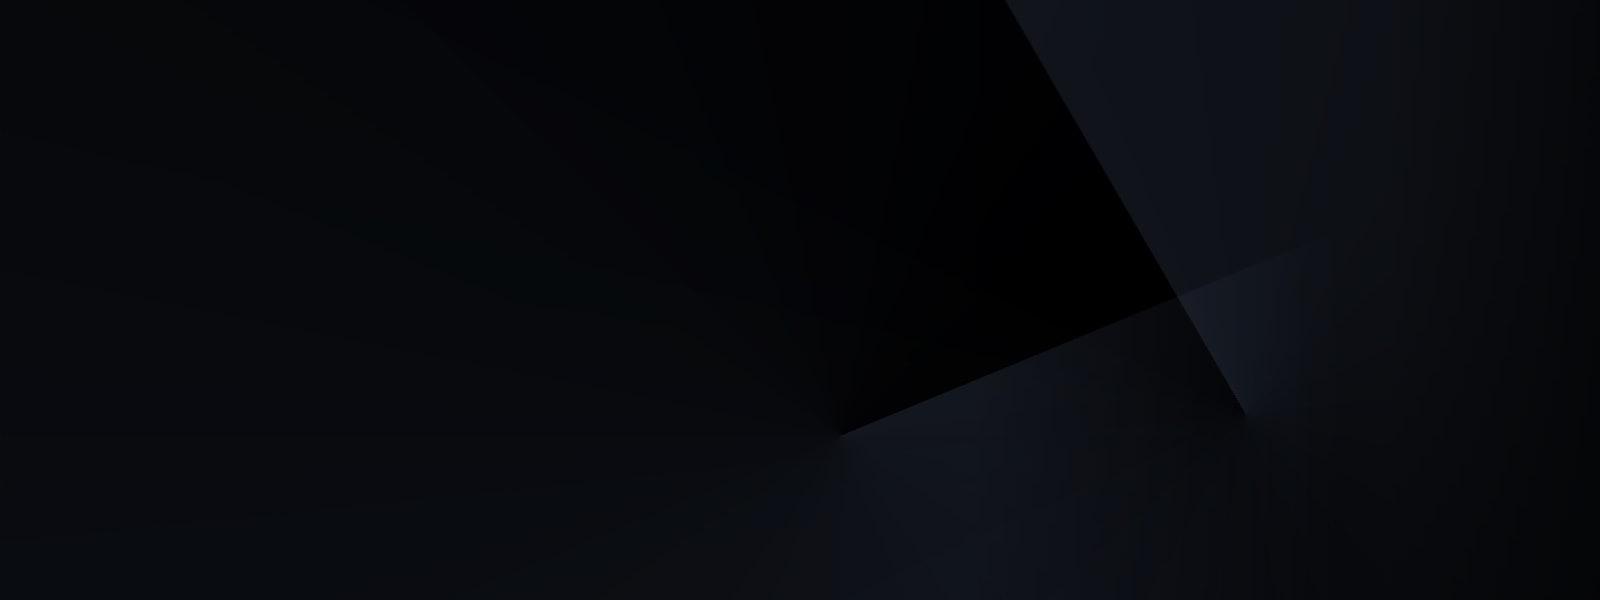 404 Background